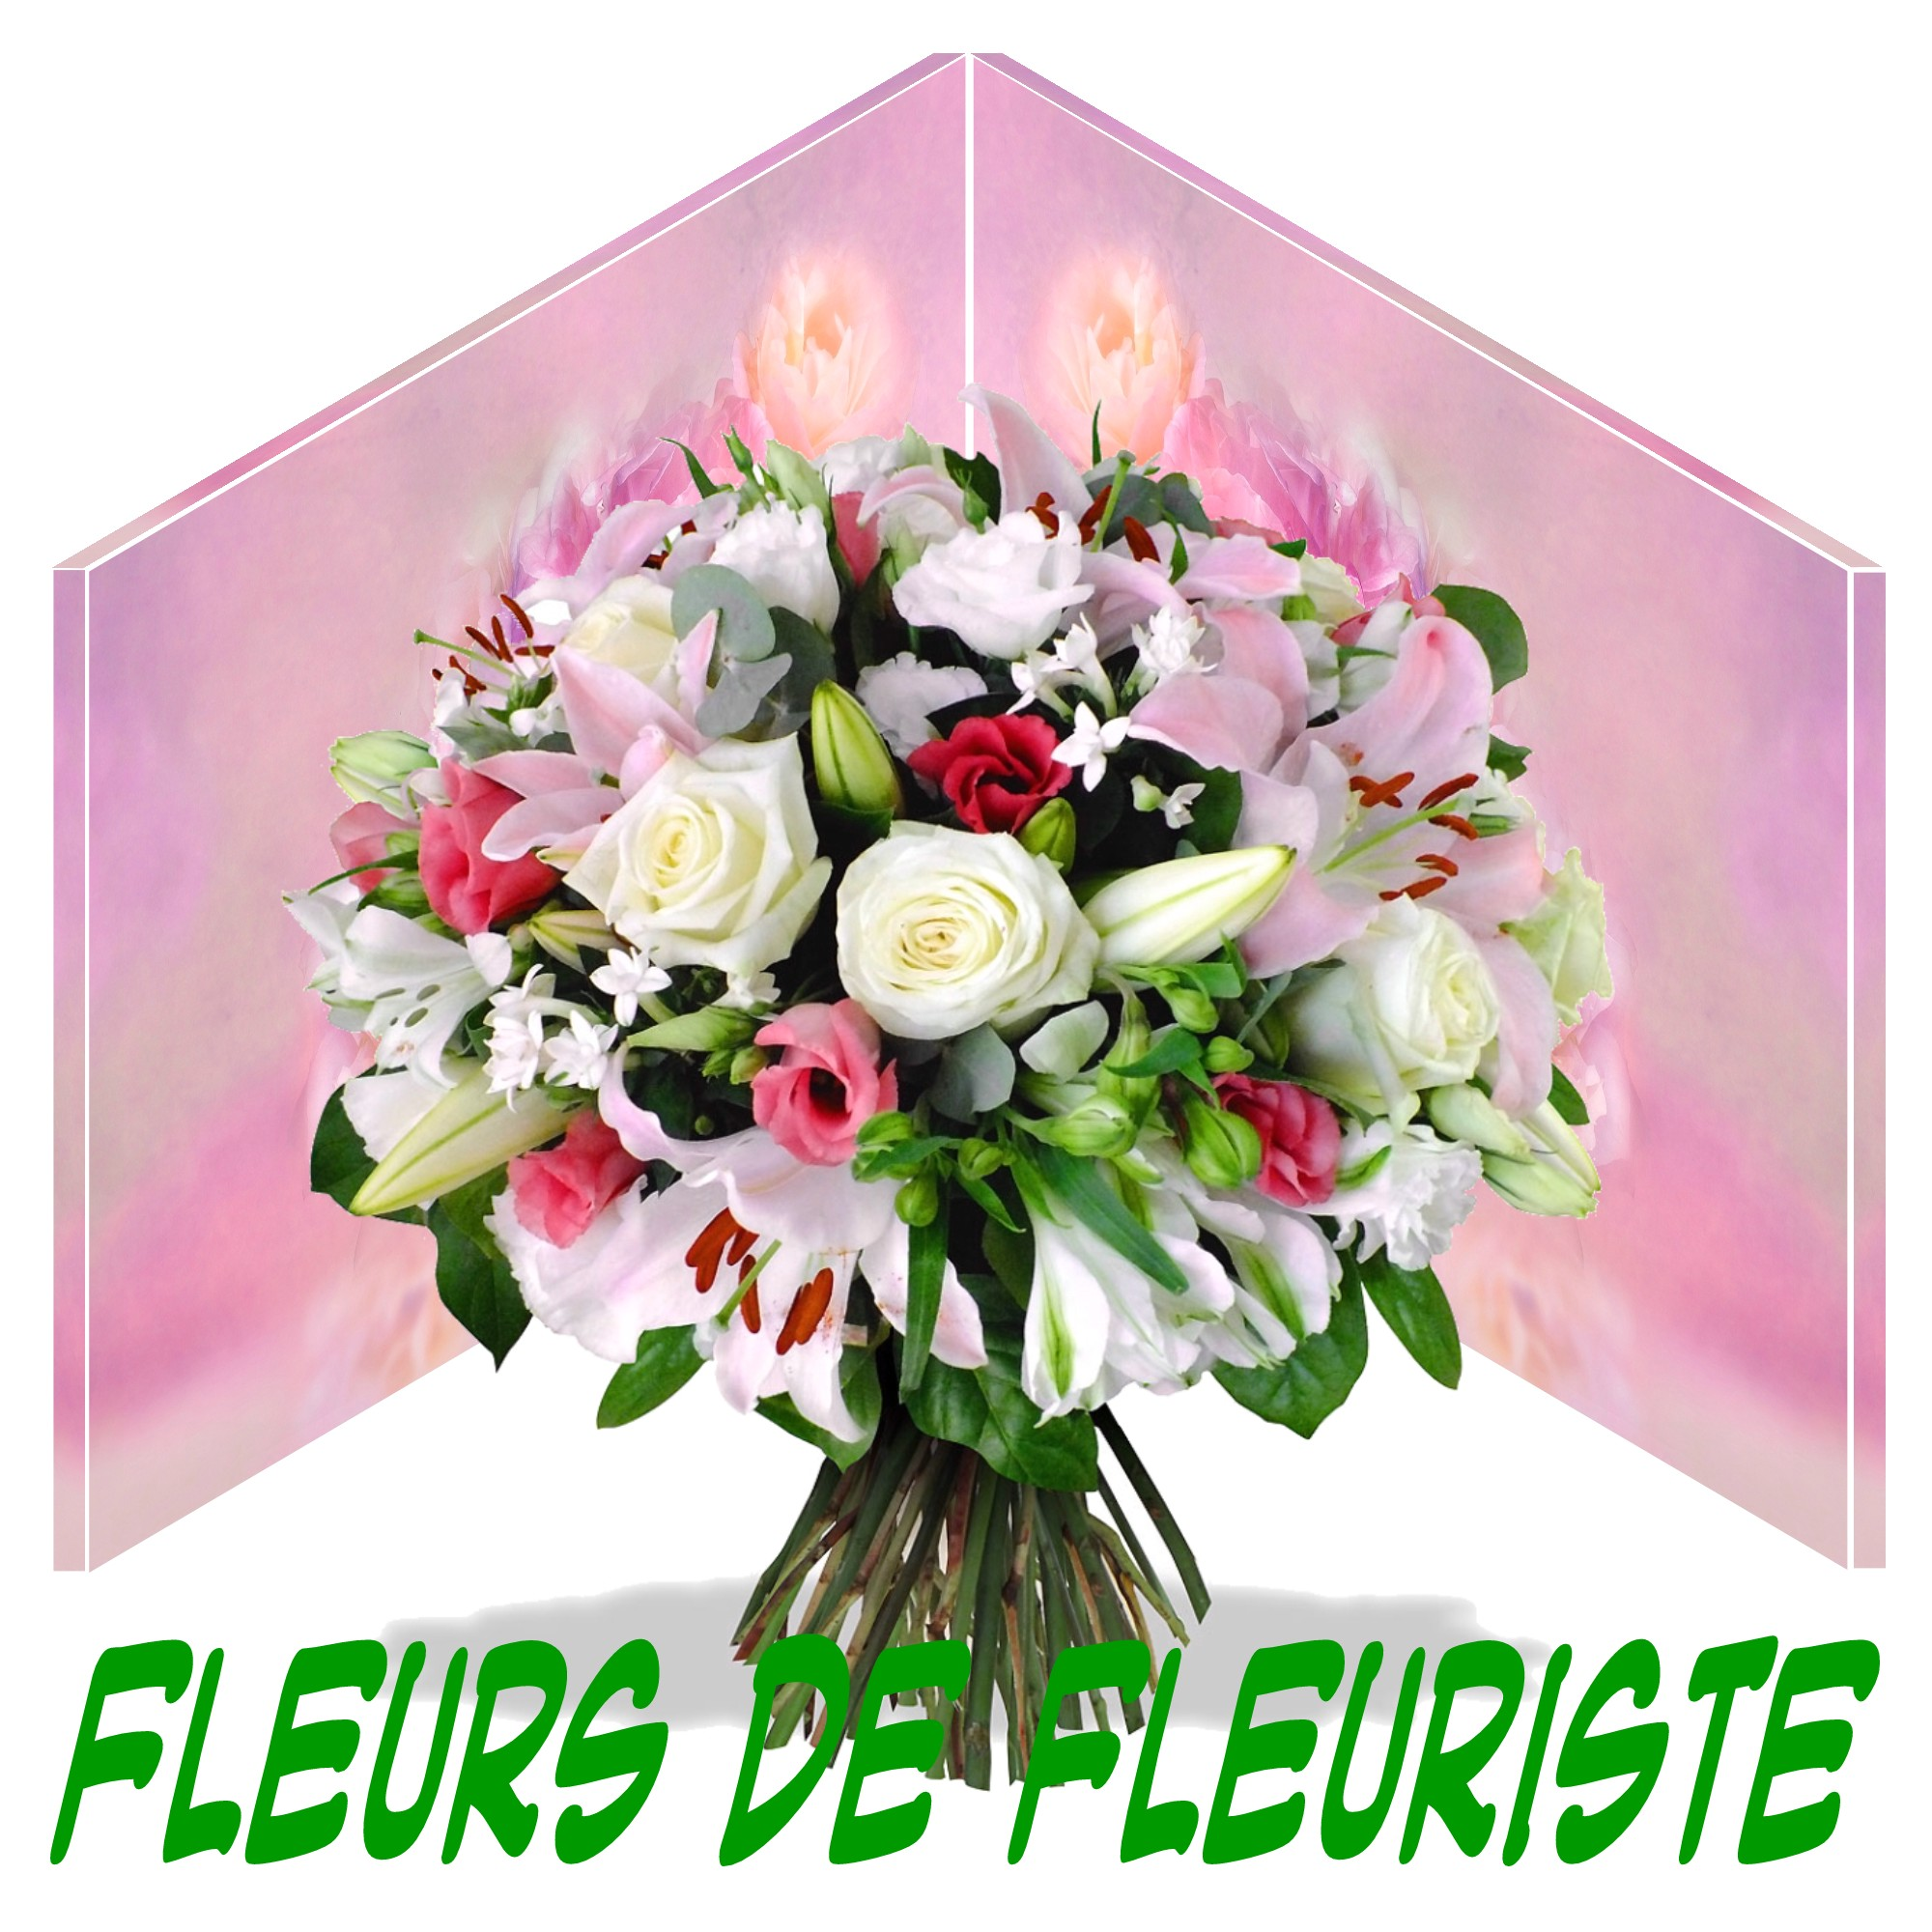 Fleuriste Paris, Fleuriste Marseille, Fleuriste Lyon, Fleuriste Toulouse, Fleuriste Nice, Fleuriste Nantes, Fleuriste Montpellier, Fleuriste Strasbourg, Fleuriste Bordeaux, Fleuriste Lille, Fleuriste Rennes, Fleuriste Reims, Fleuriste Le Havre, Fleuriste Saint-Étienne, Fleuriste Toulon, Fleuriste Grenoble